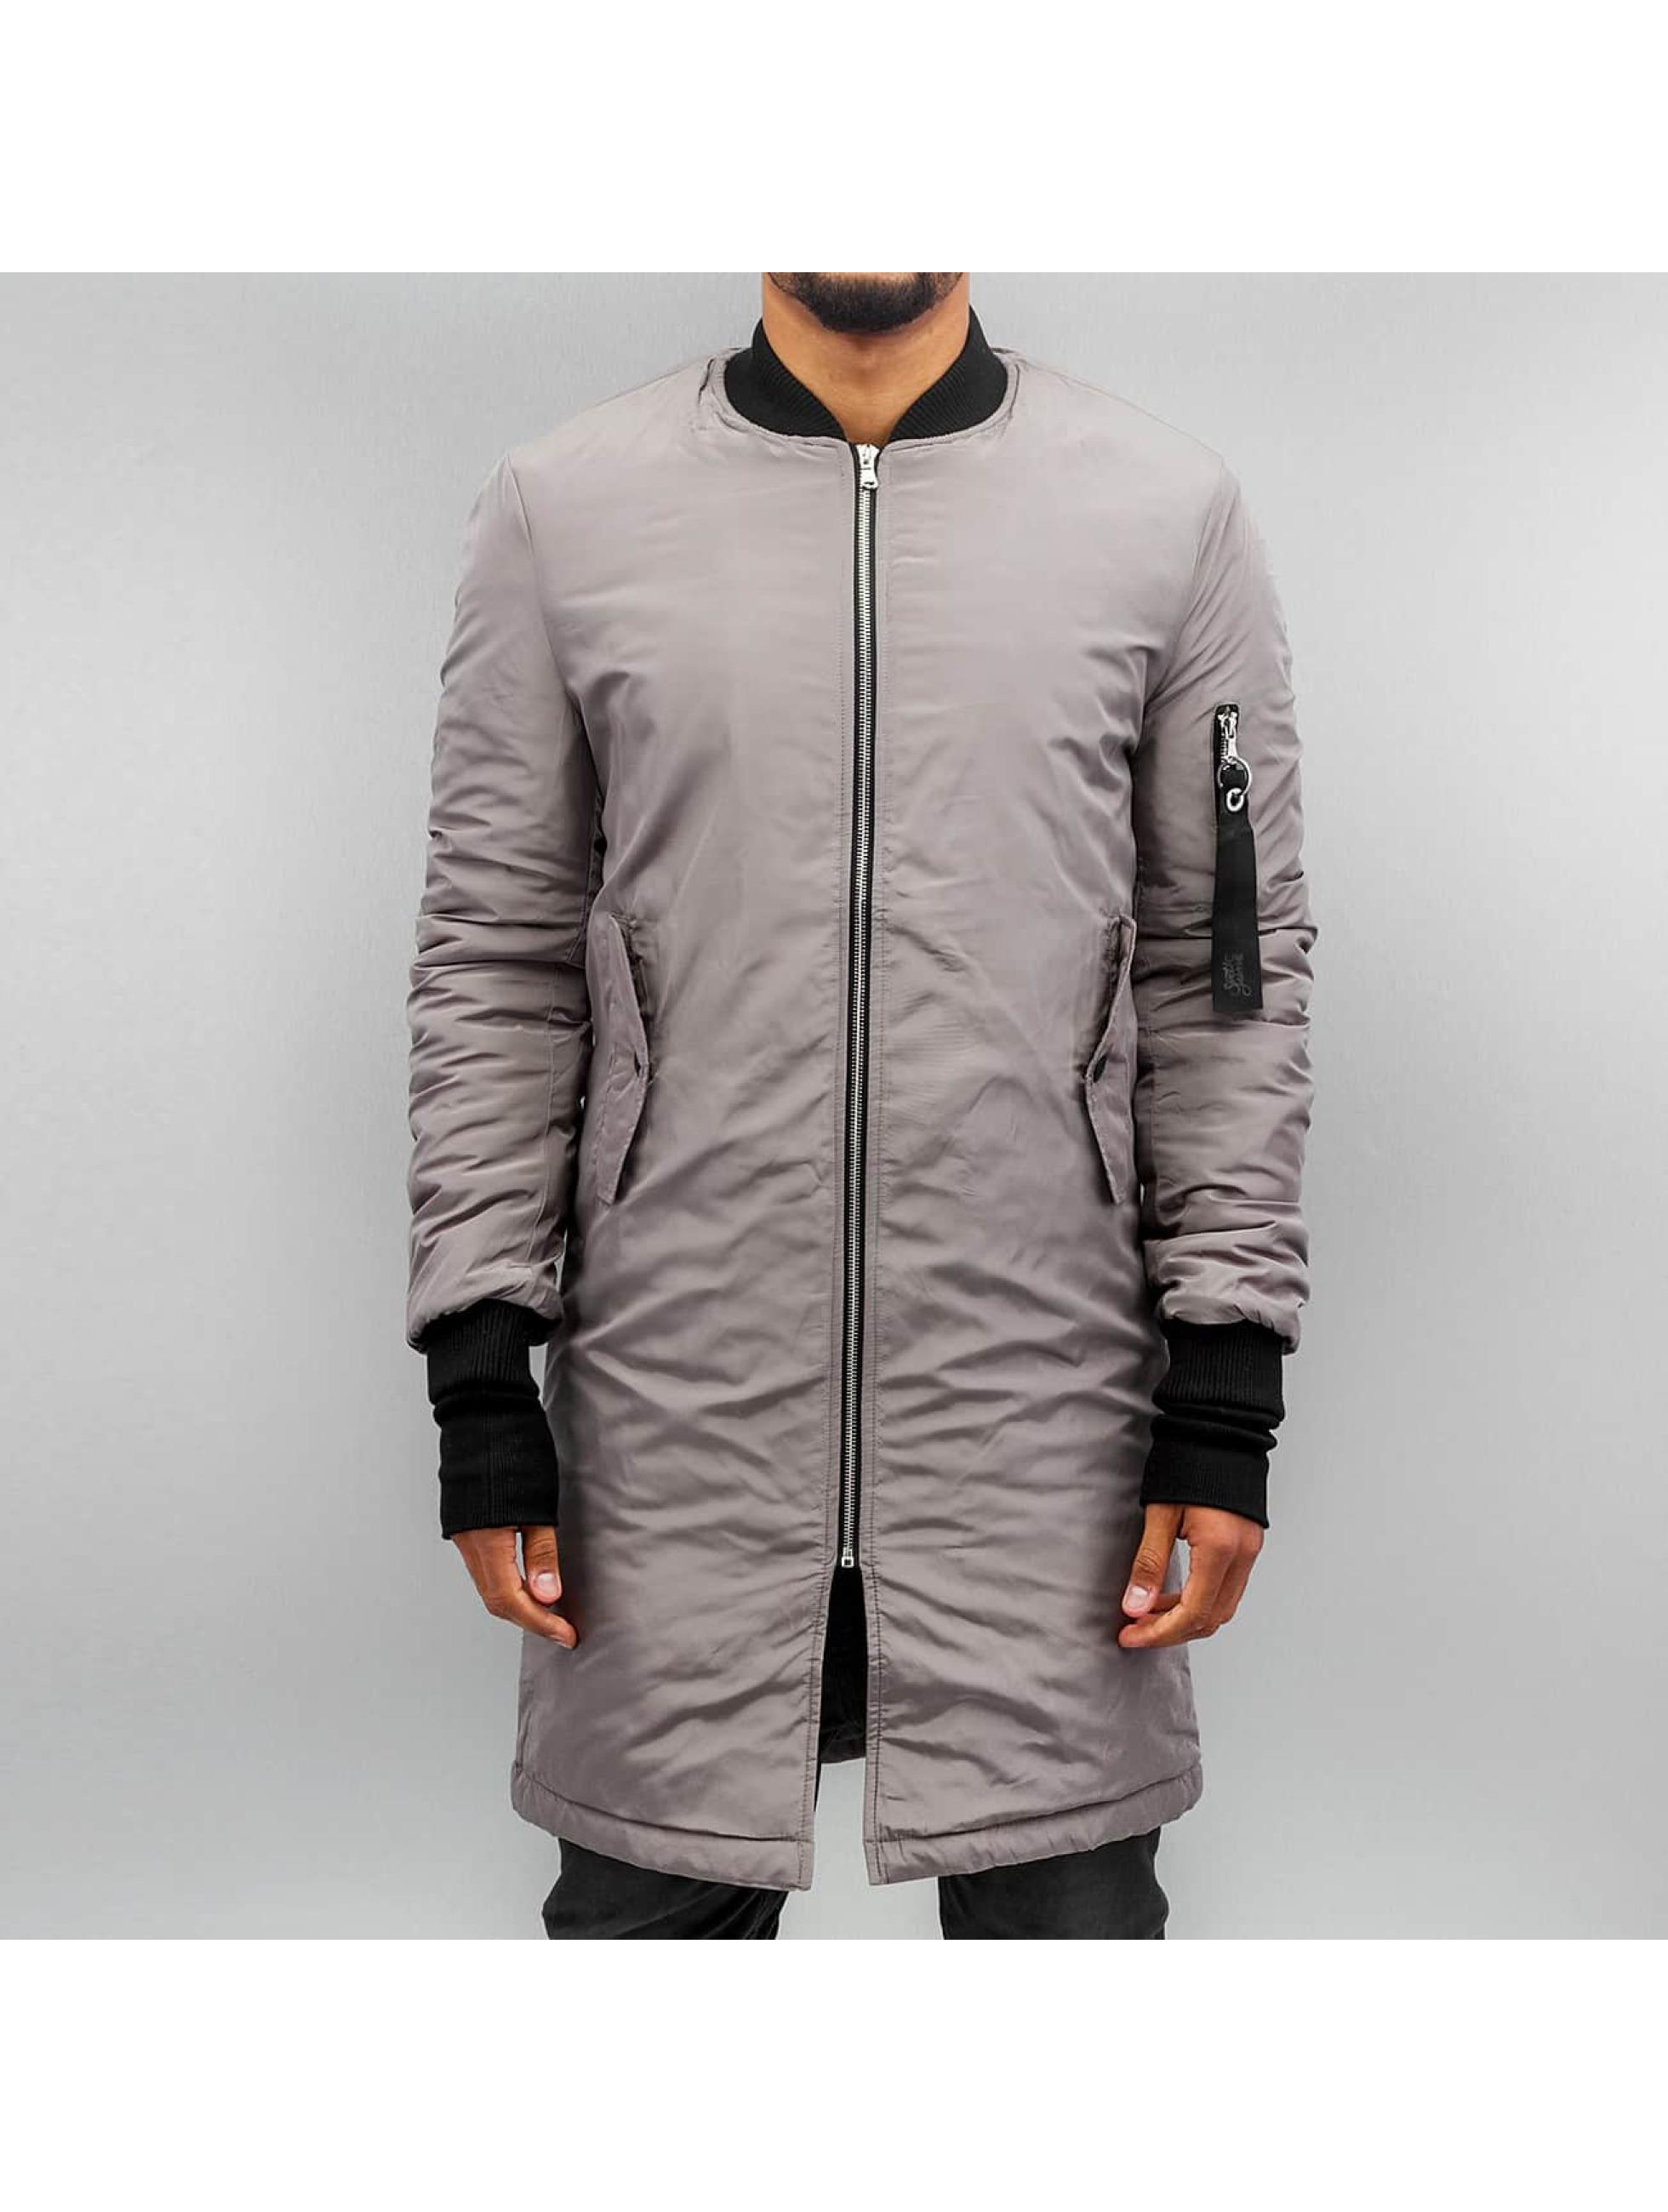 Sixth June Демисезонная куртка Bomber серый